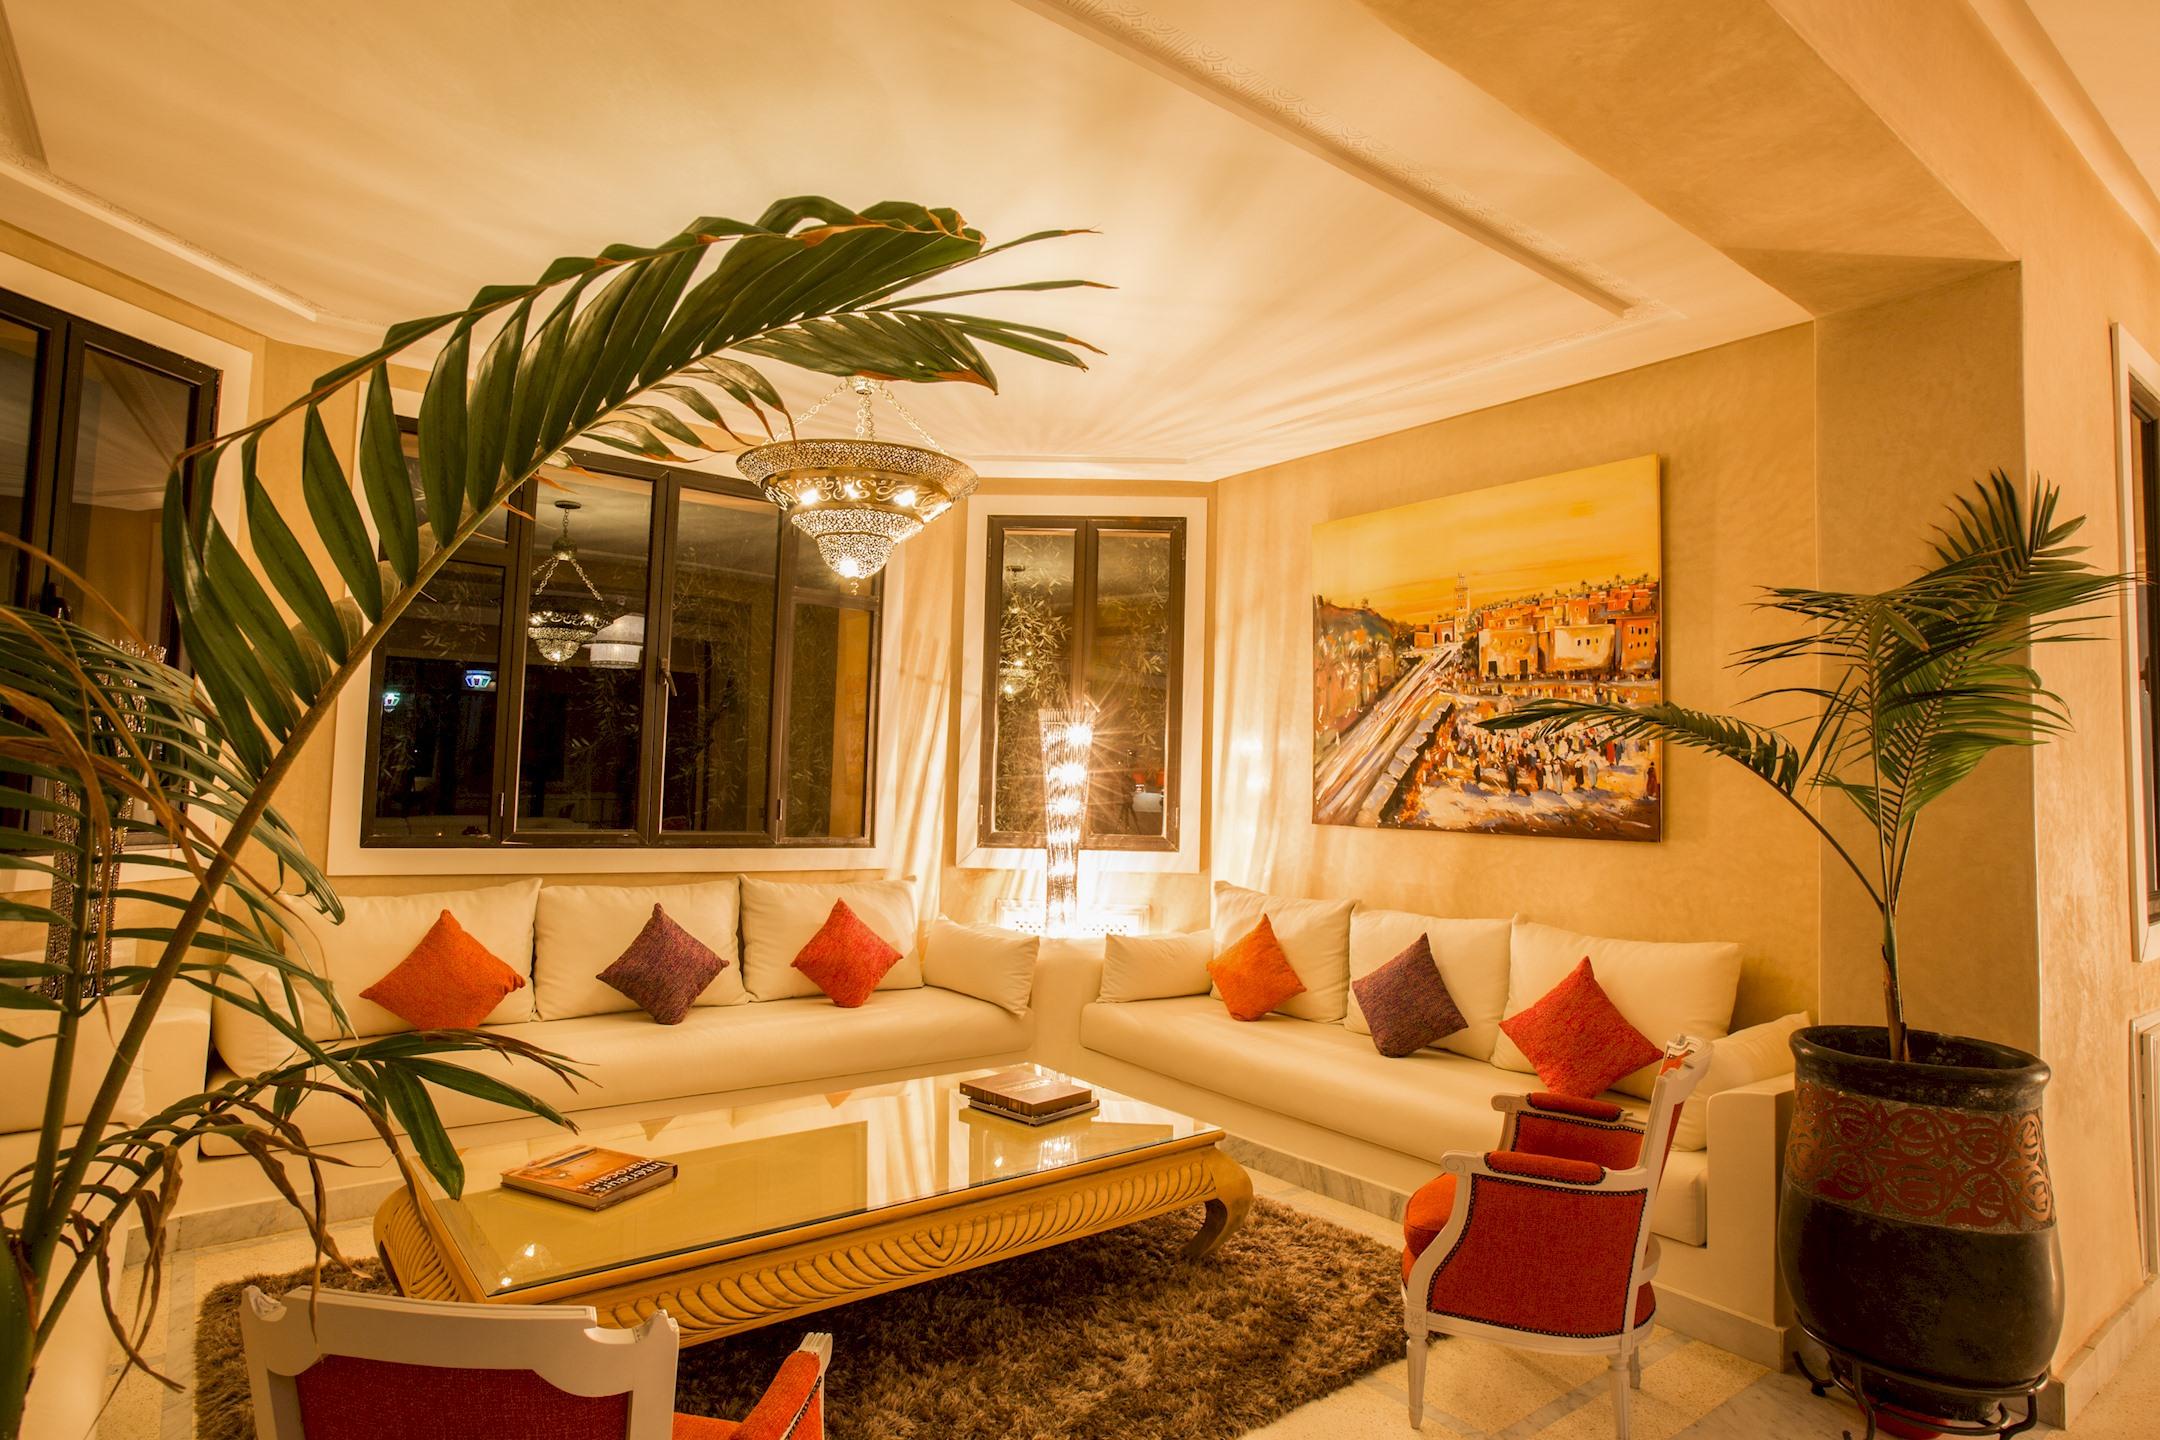 Apartment VILLA KOUTOUBIA - PISCINE CHAUFFEE  HAMMAM  JACUZZI  PETIT-DEJEUNER A MARRAKECH photo 20159663